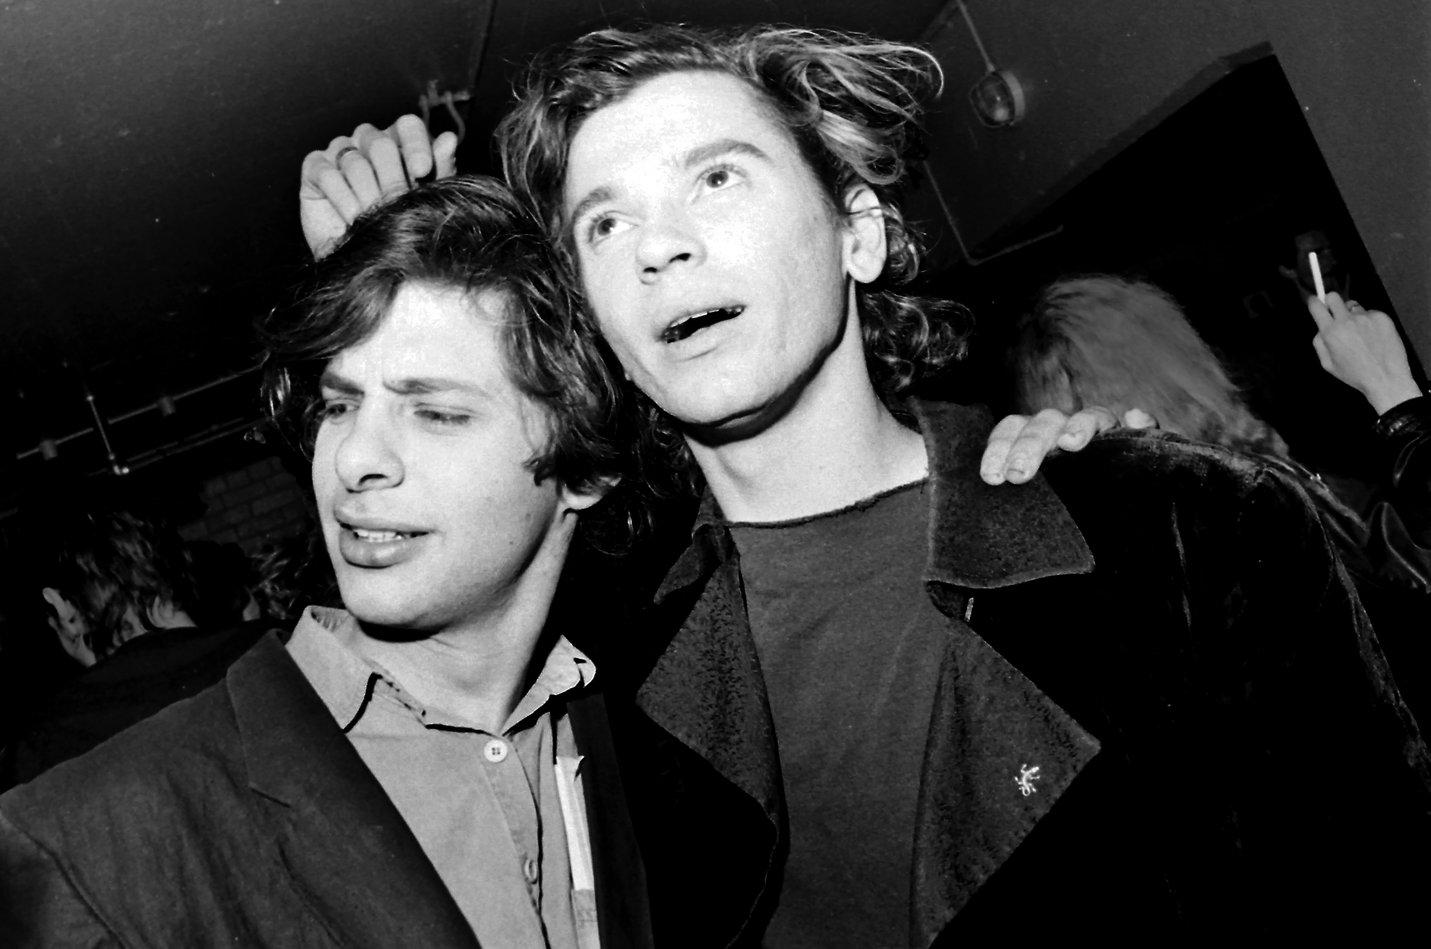 Michael Hutchence and Richard Lowenstein